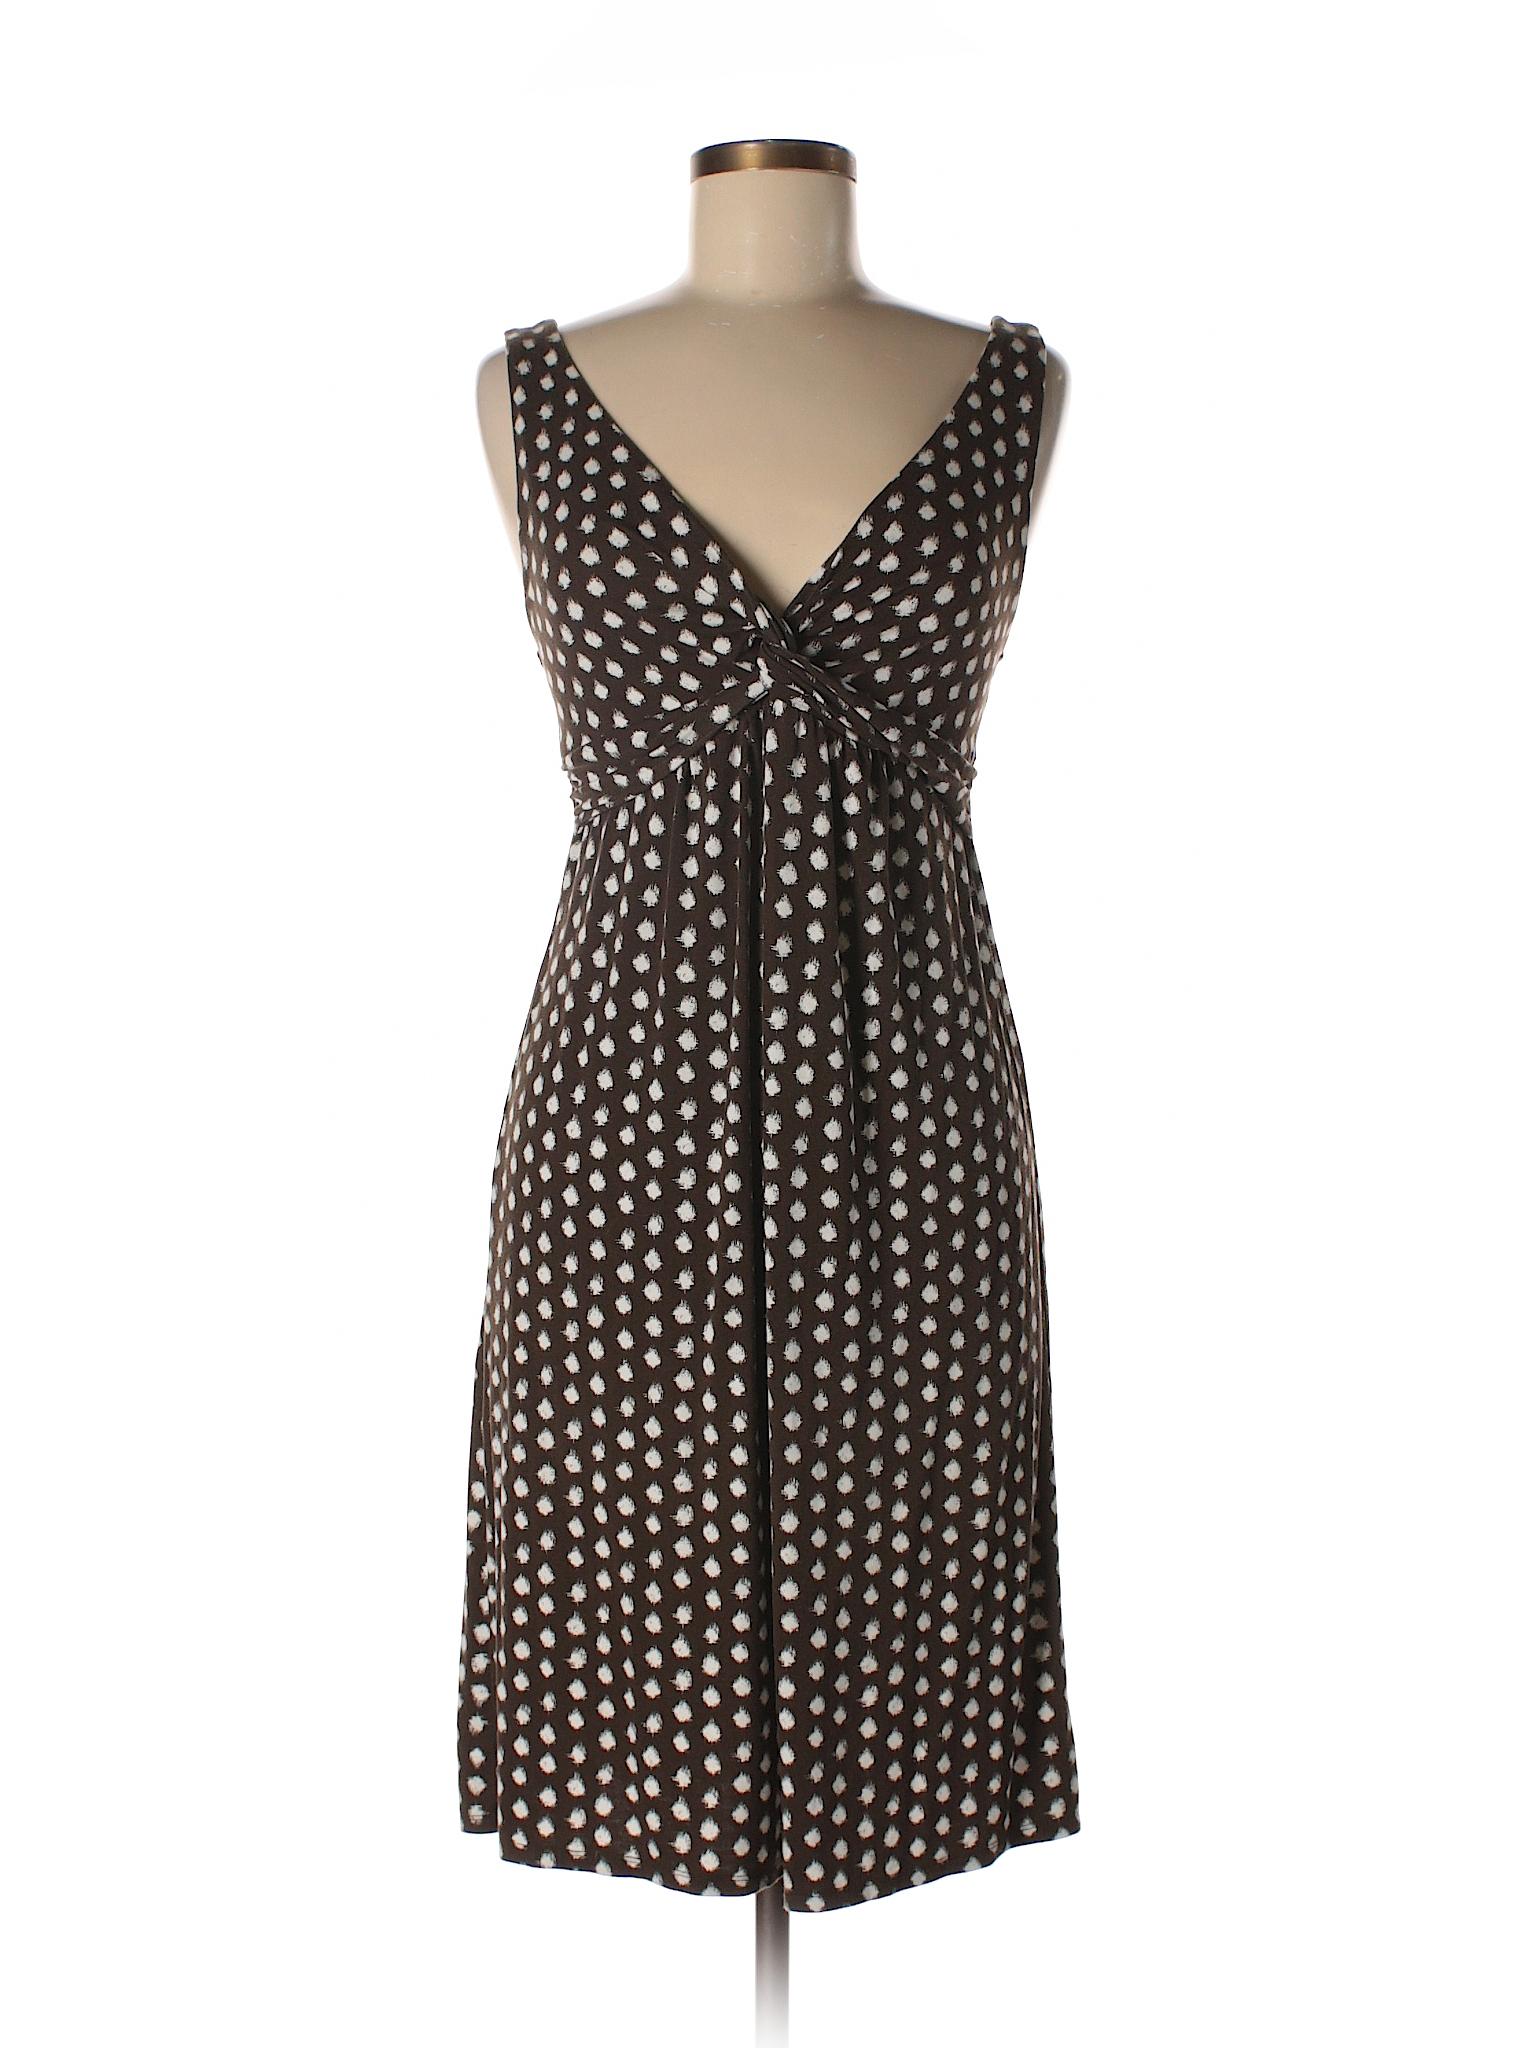 Boutique winter Merona Merona Dress Dress Merona Casual winter Casual Boutique Casual winter Dress Boutique qappzB